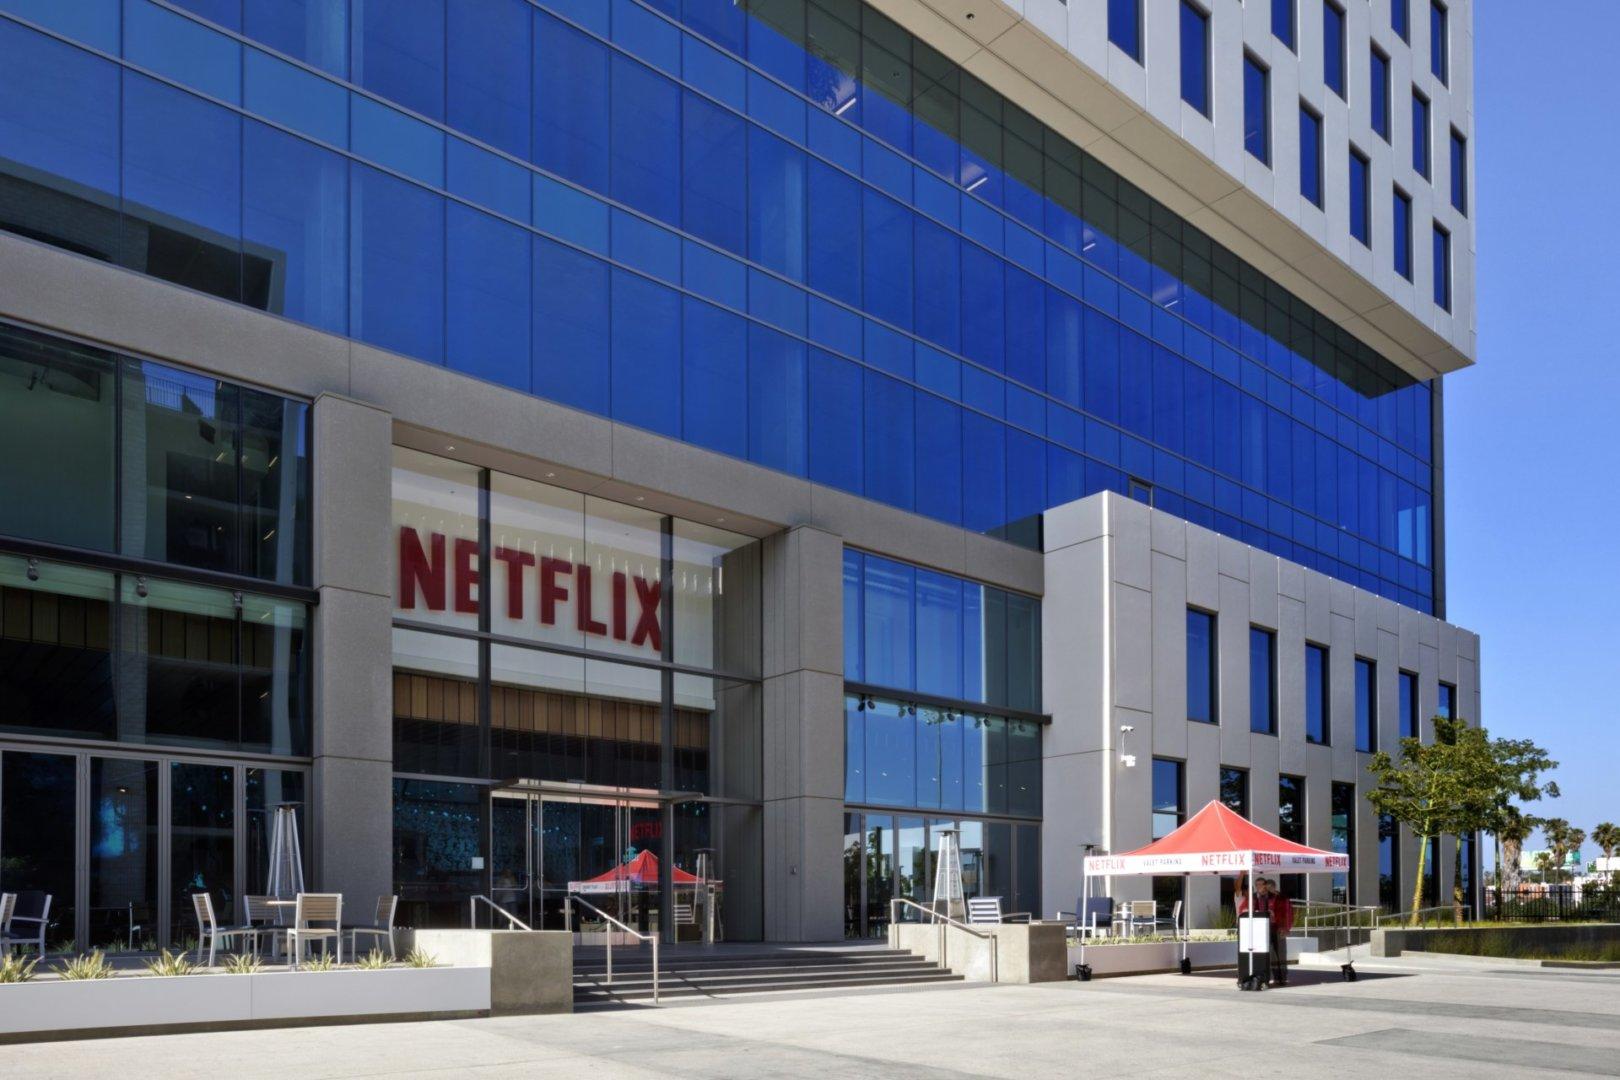 Netflix HQ Los Angeles